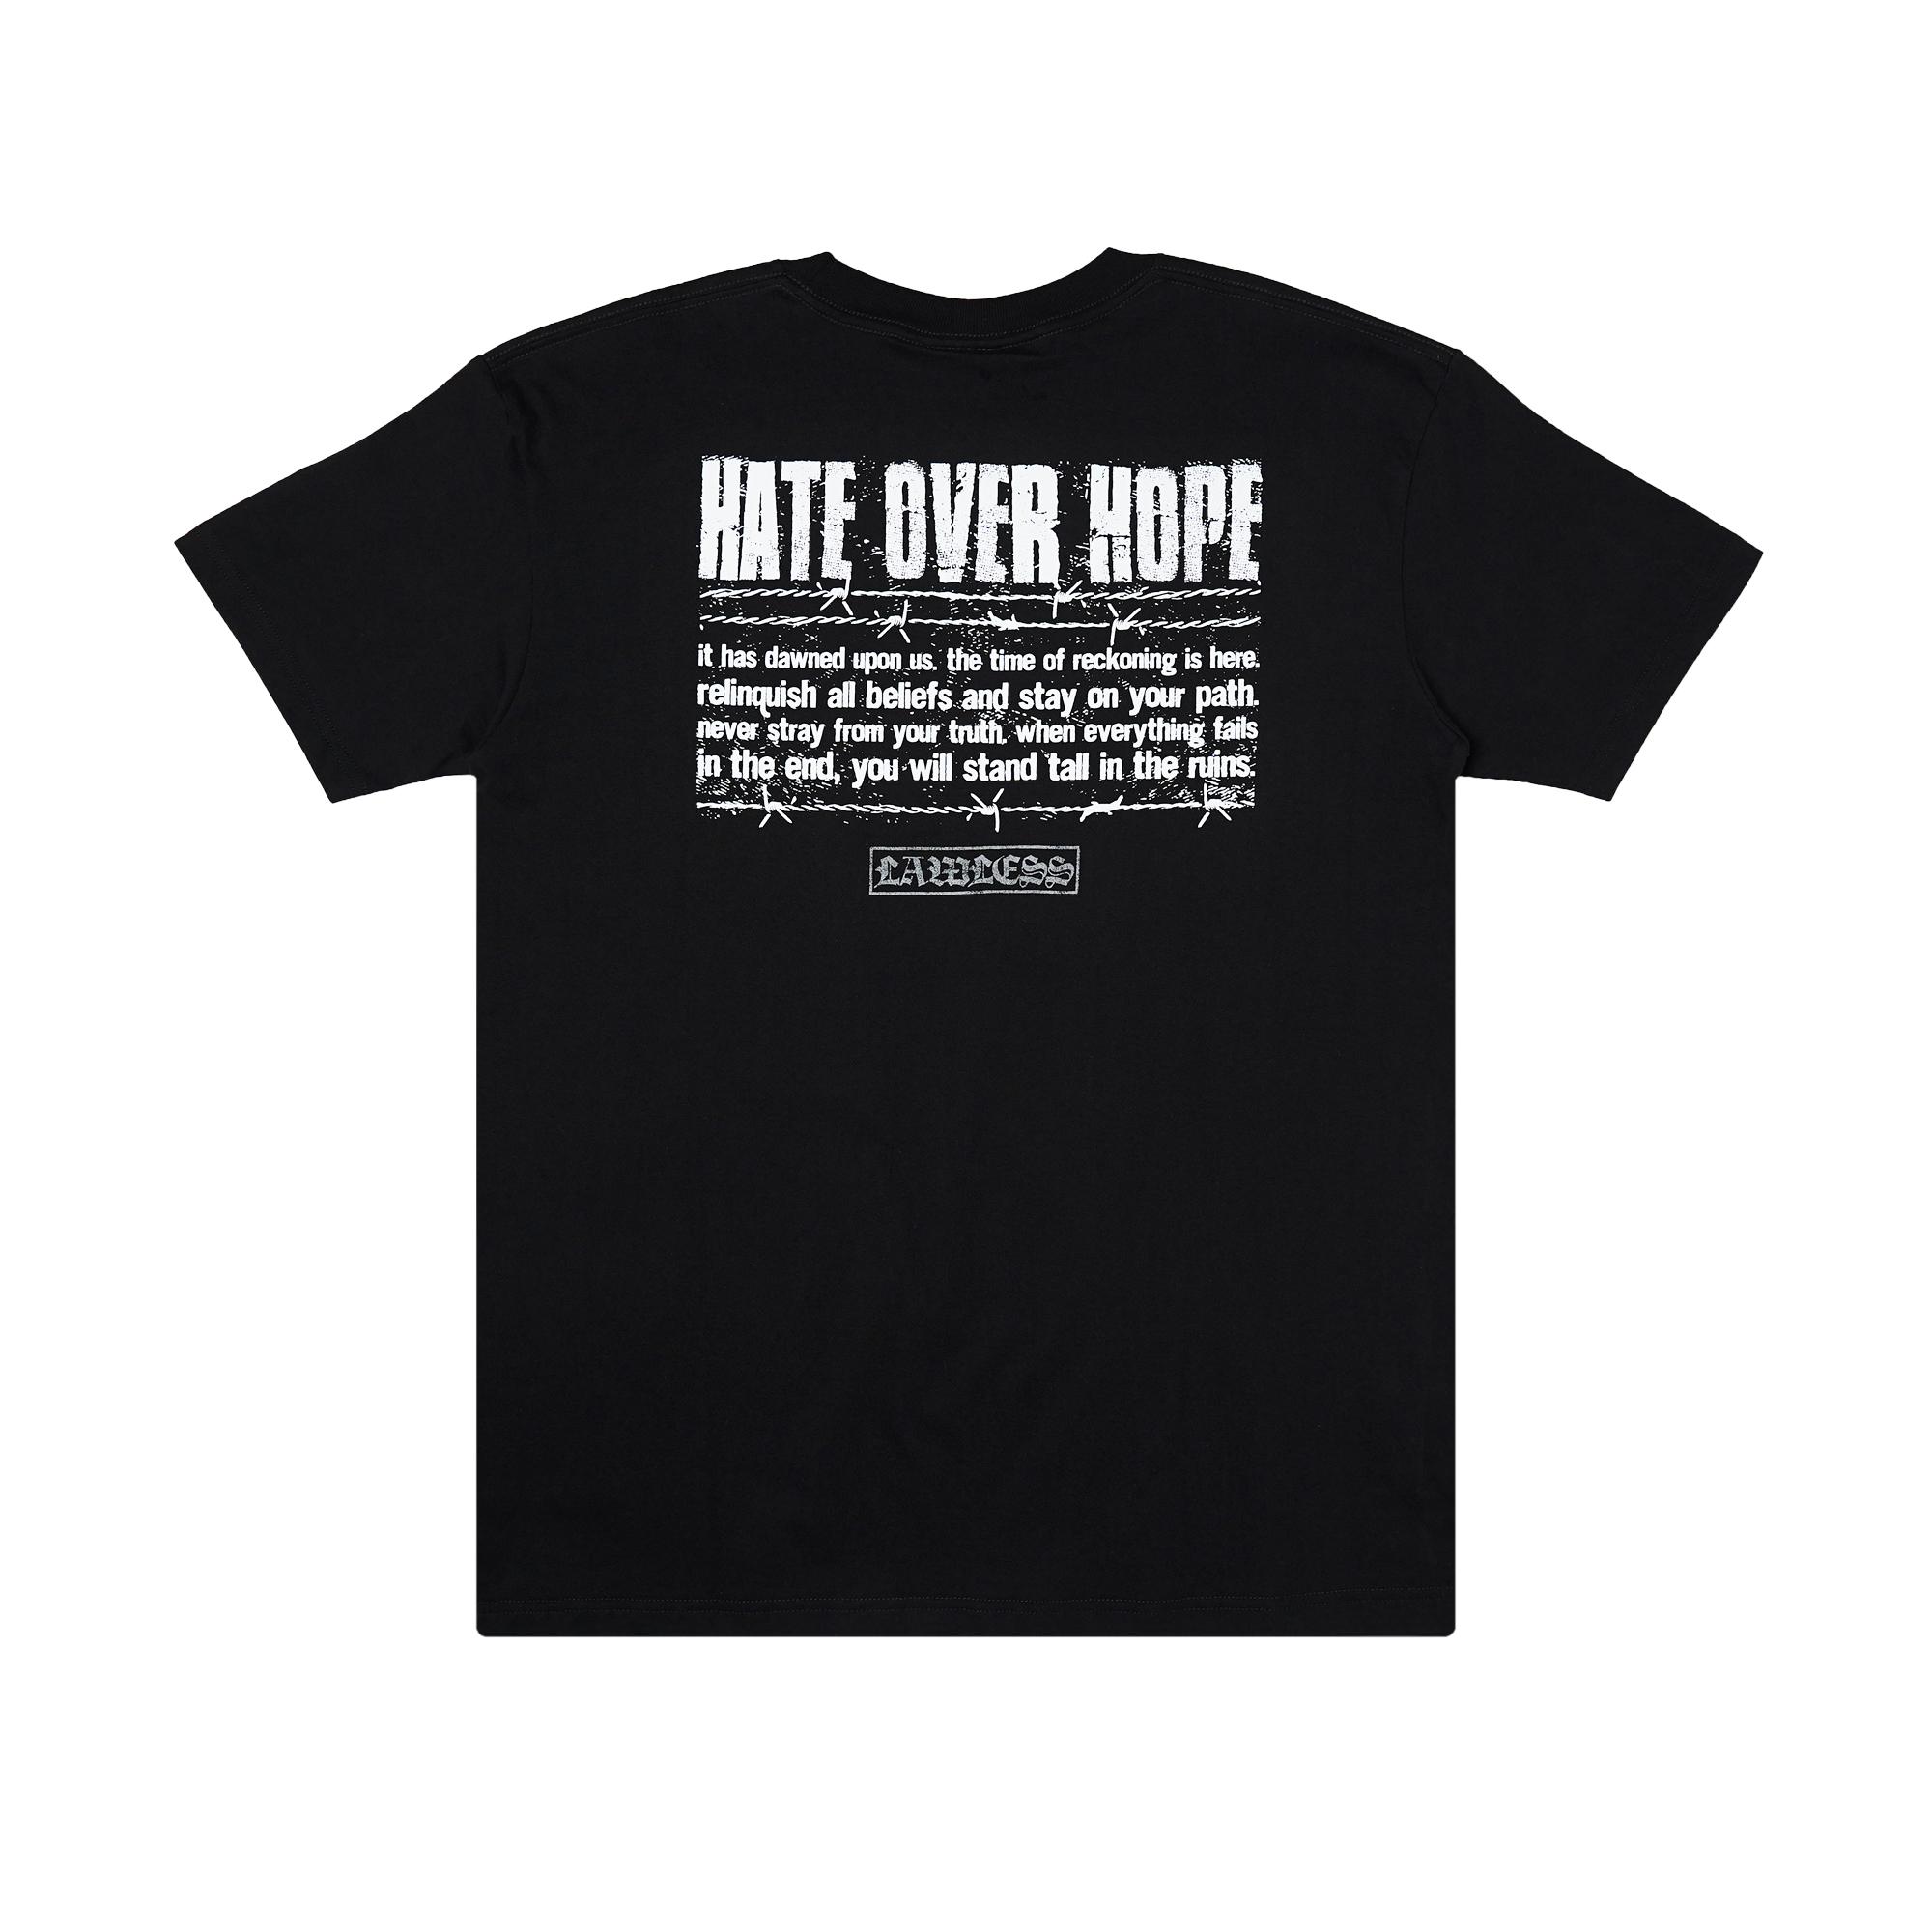 lawless_hateoverhope_belakang